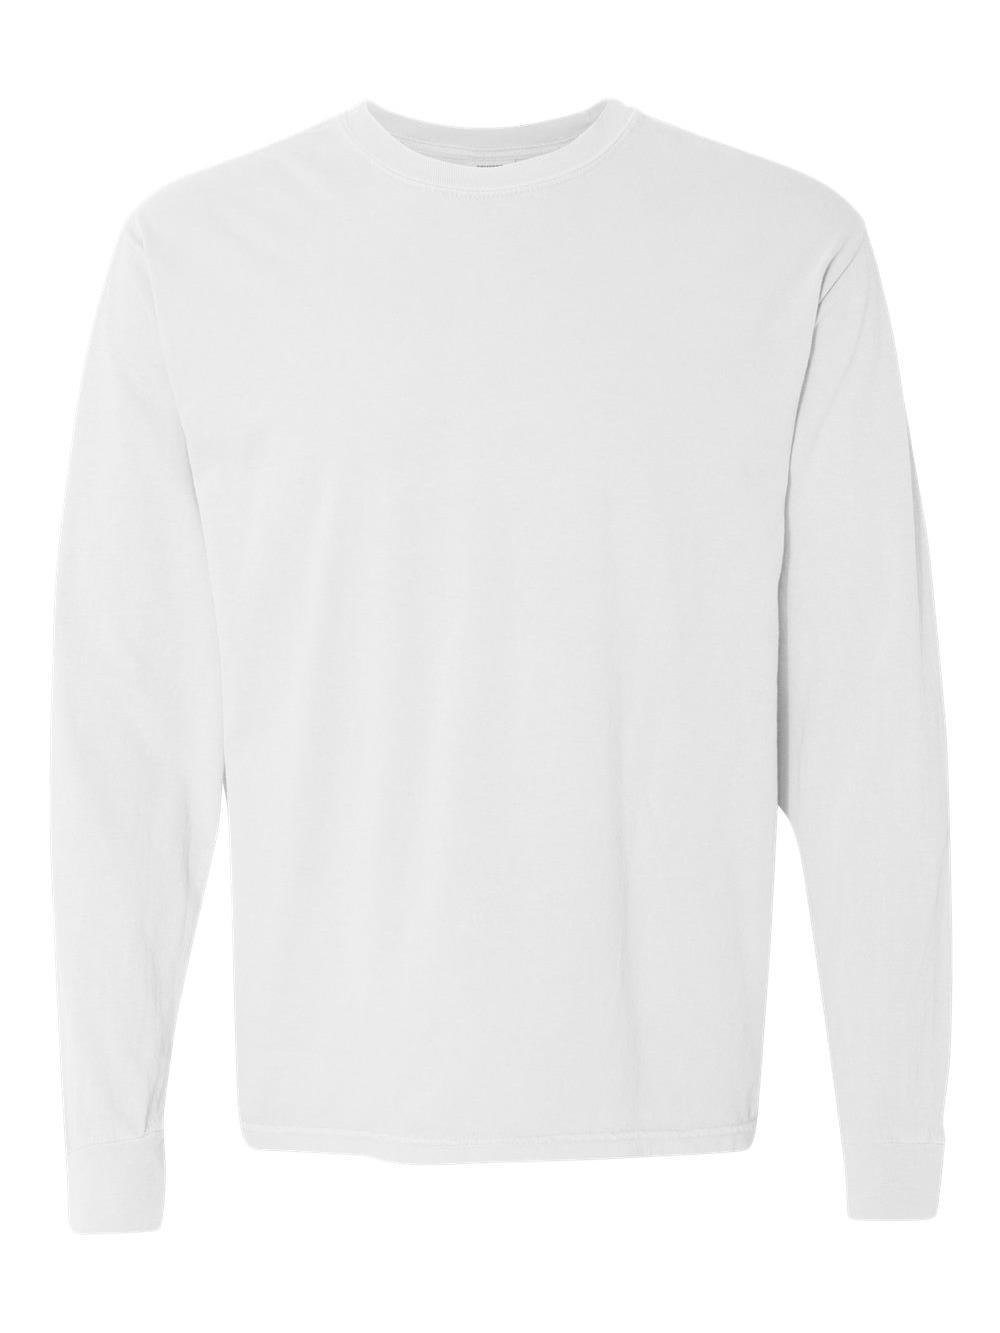 Comfort-Colors-Garment-Dyed-Heavyweight-Ringspun-Long-Sleeve-T-Shirt-6014 thumbnail 72